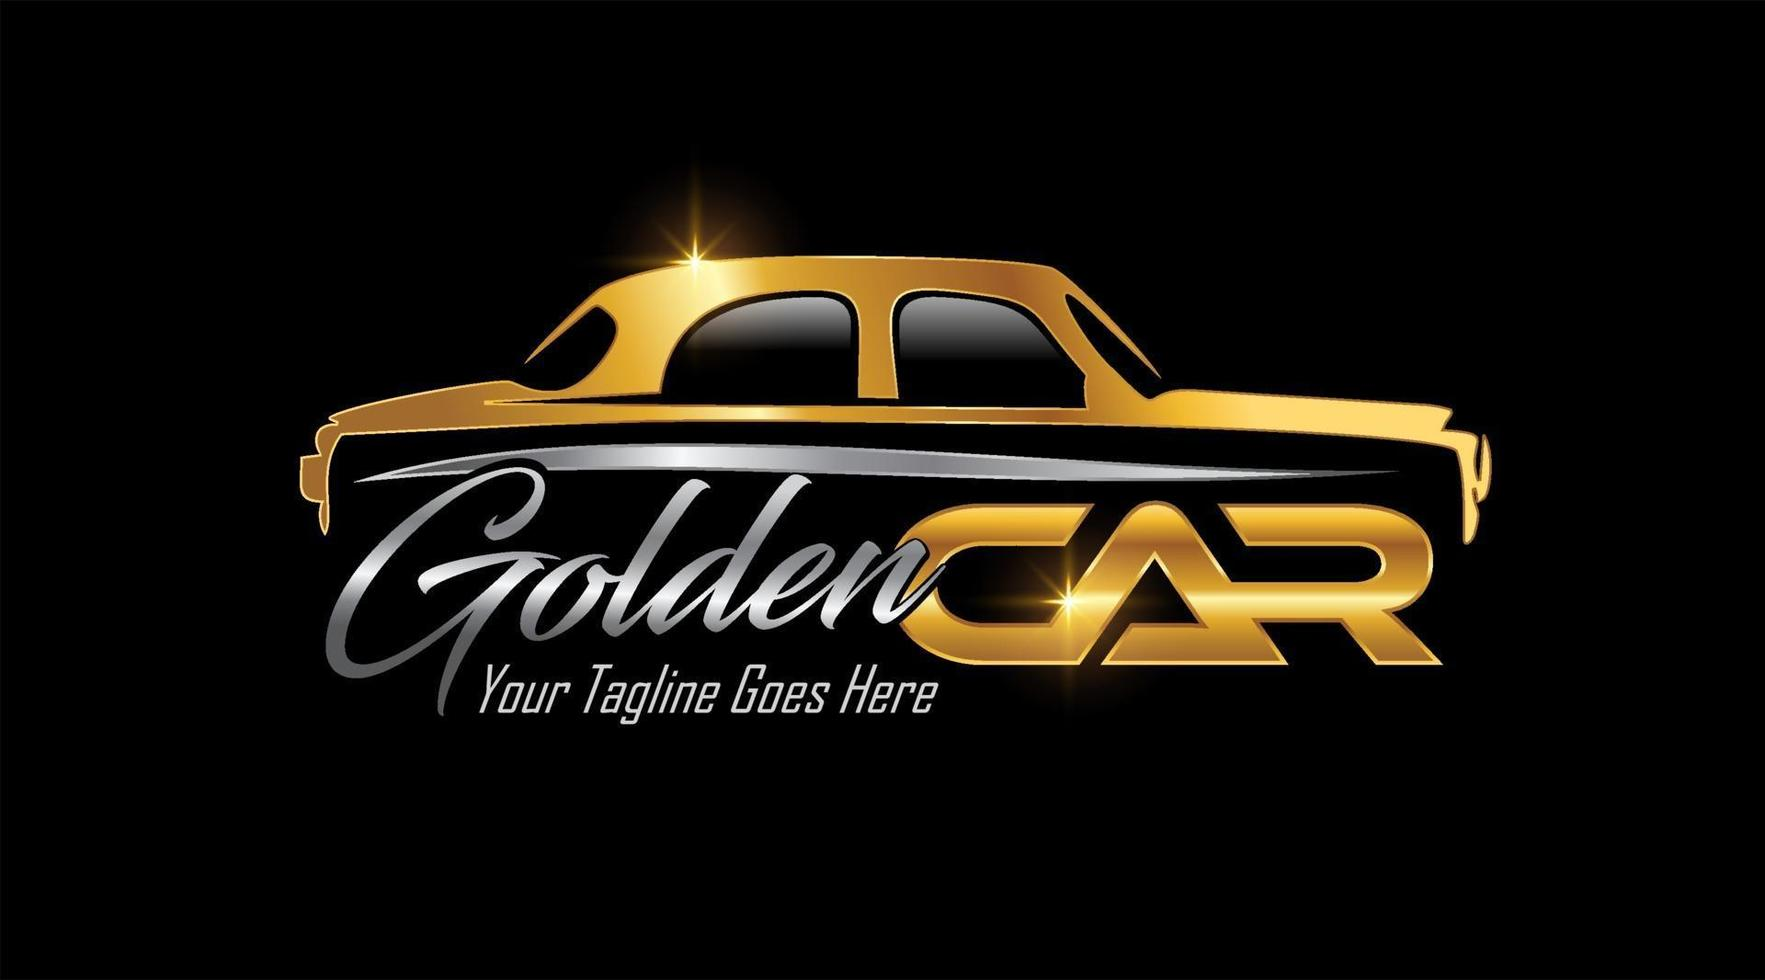 logotipo de vehículo de coche clásico dorado vector